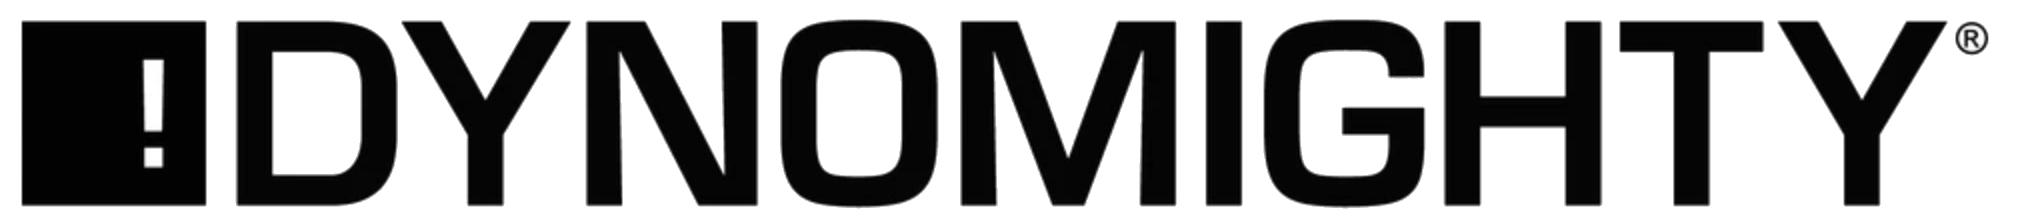 Leyna Chiang Dynomight logo